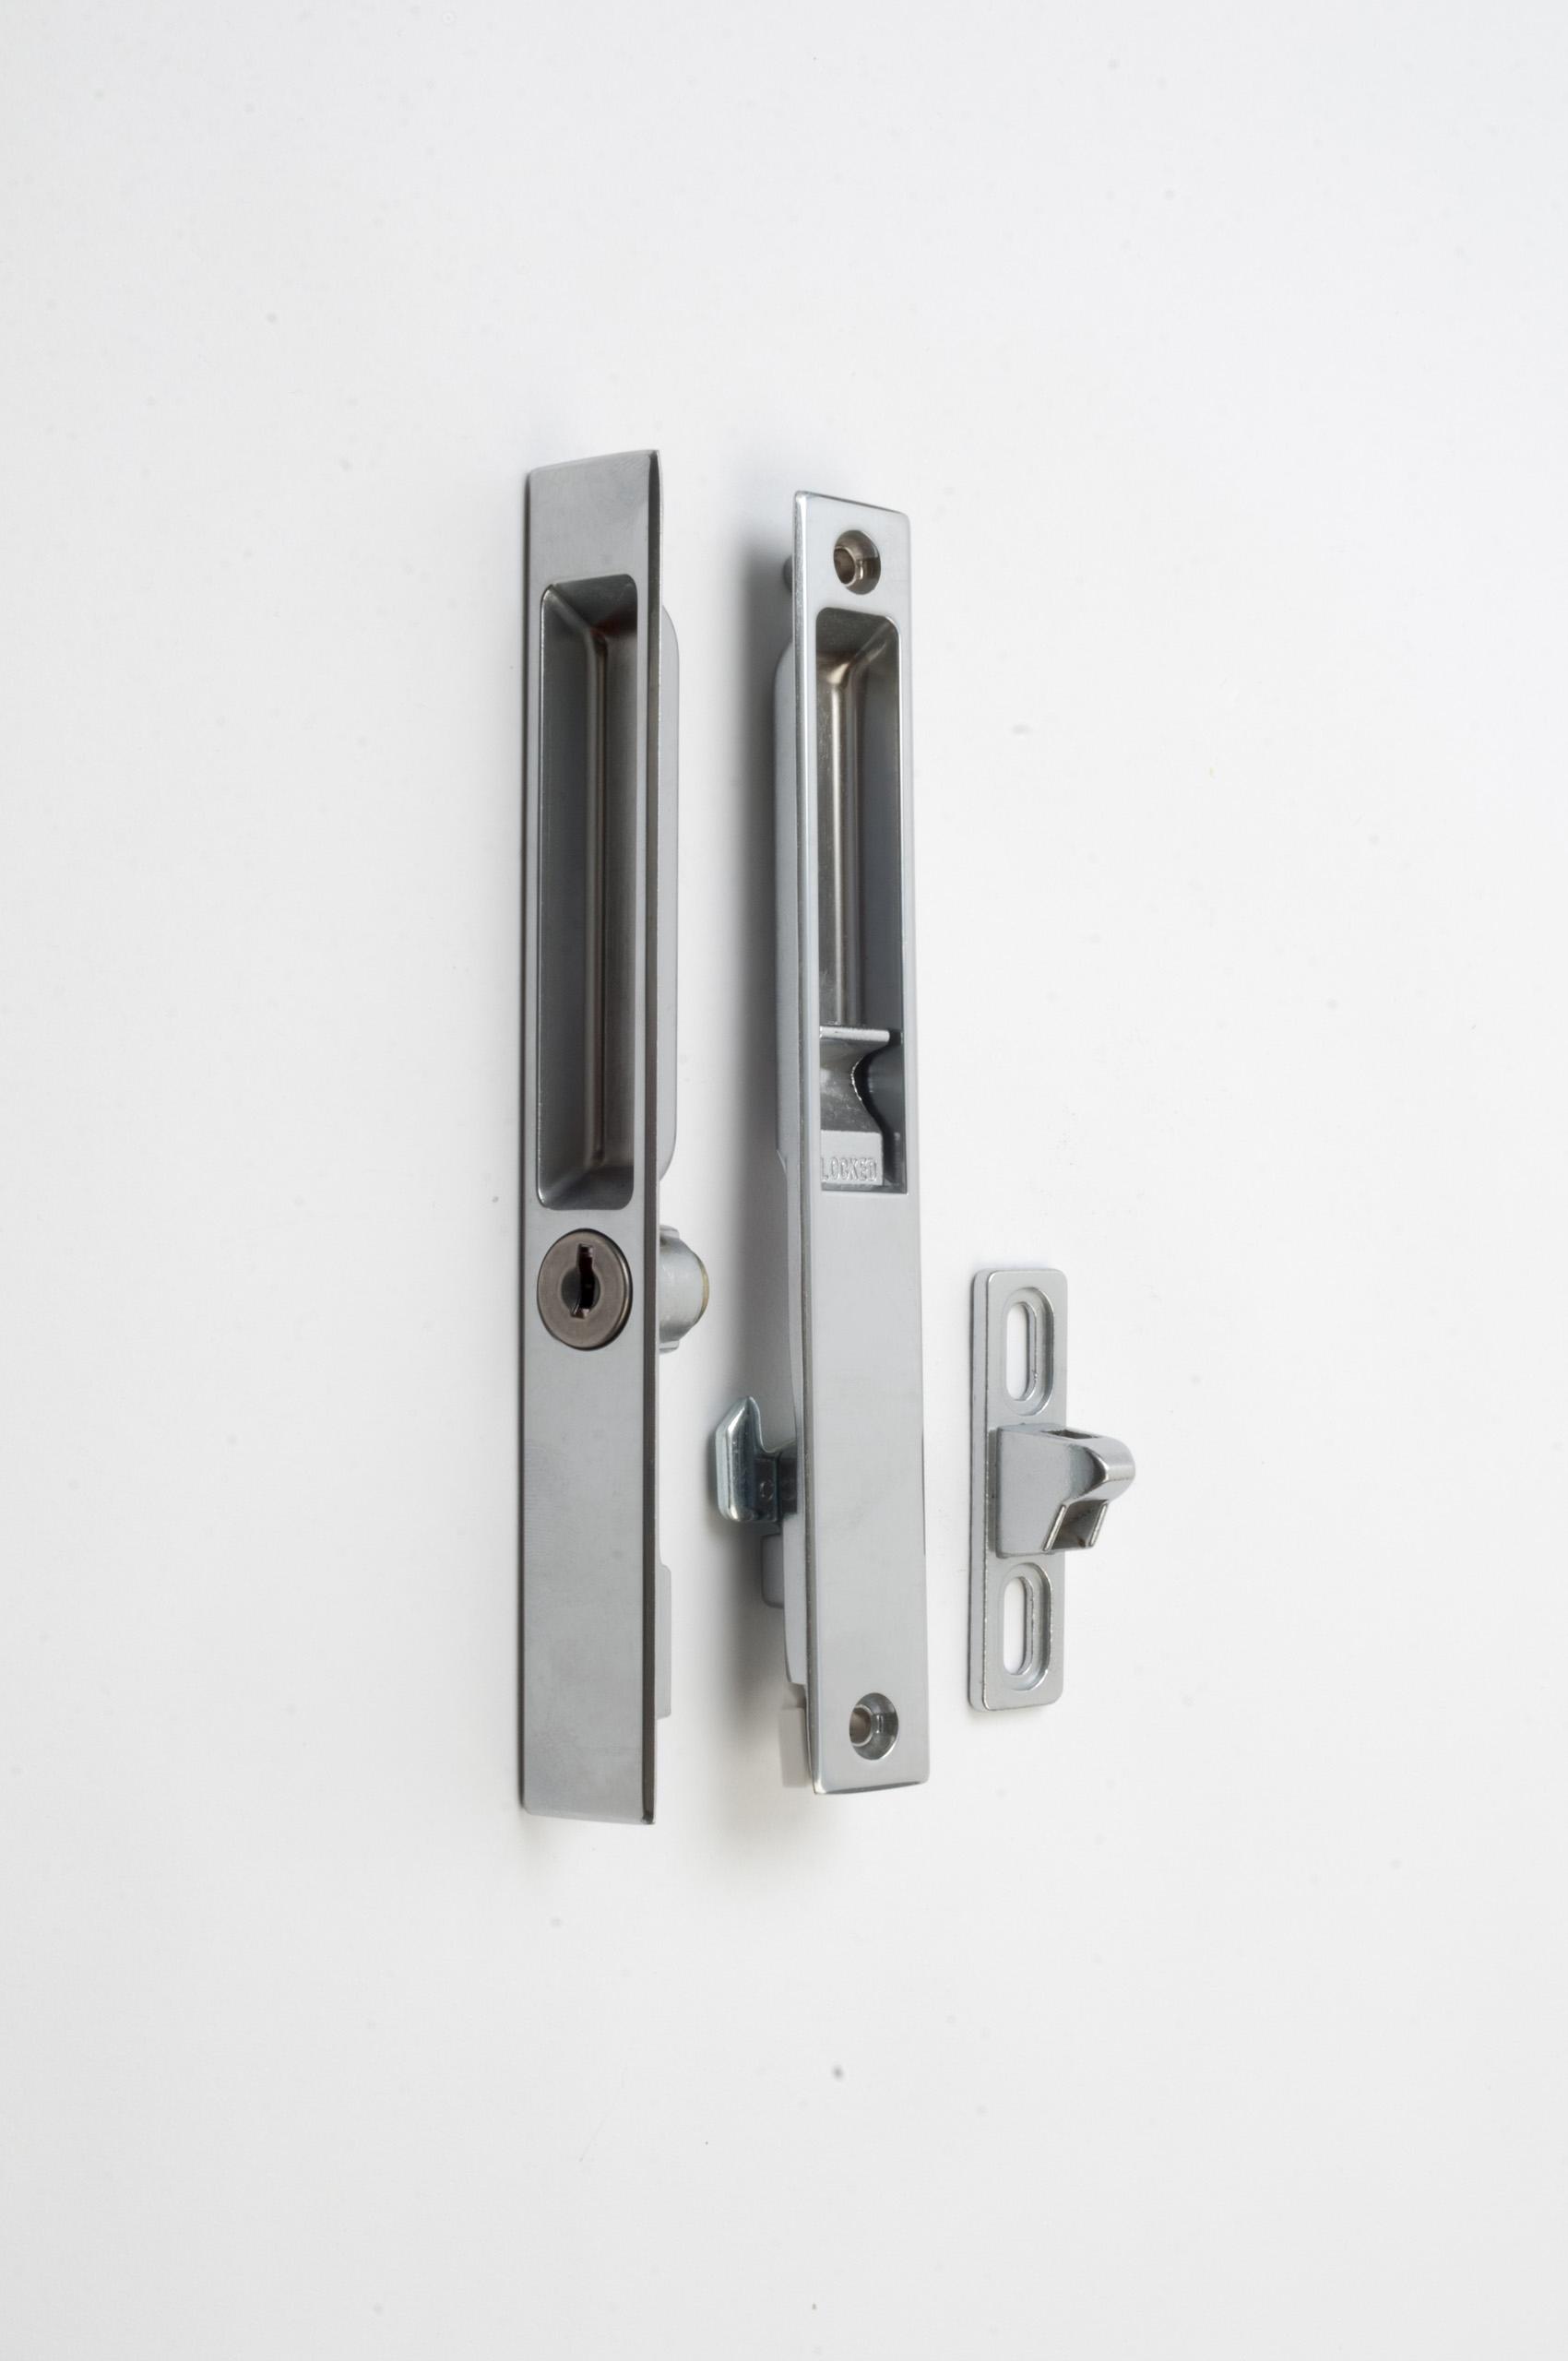 Aluminium Sliding Door Lock With Keysliding patio door lock and handle silver kd supplies